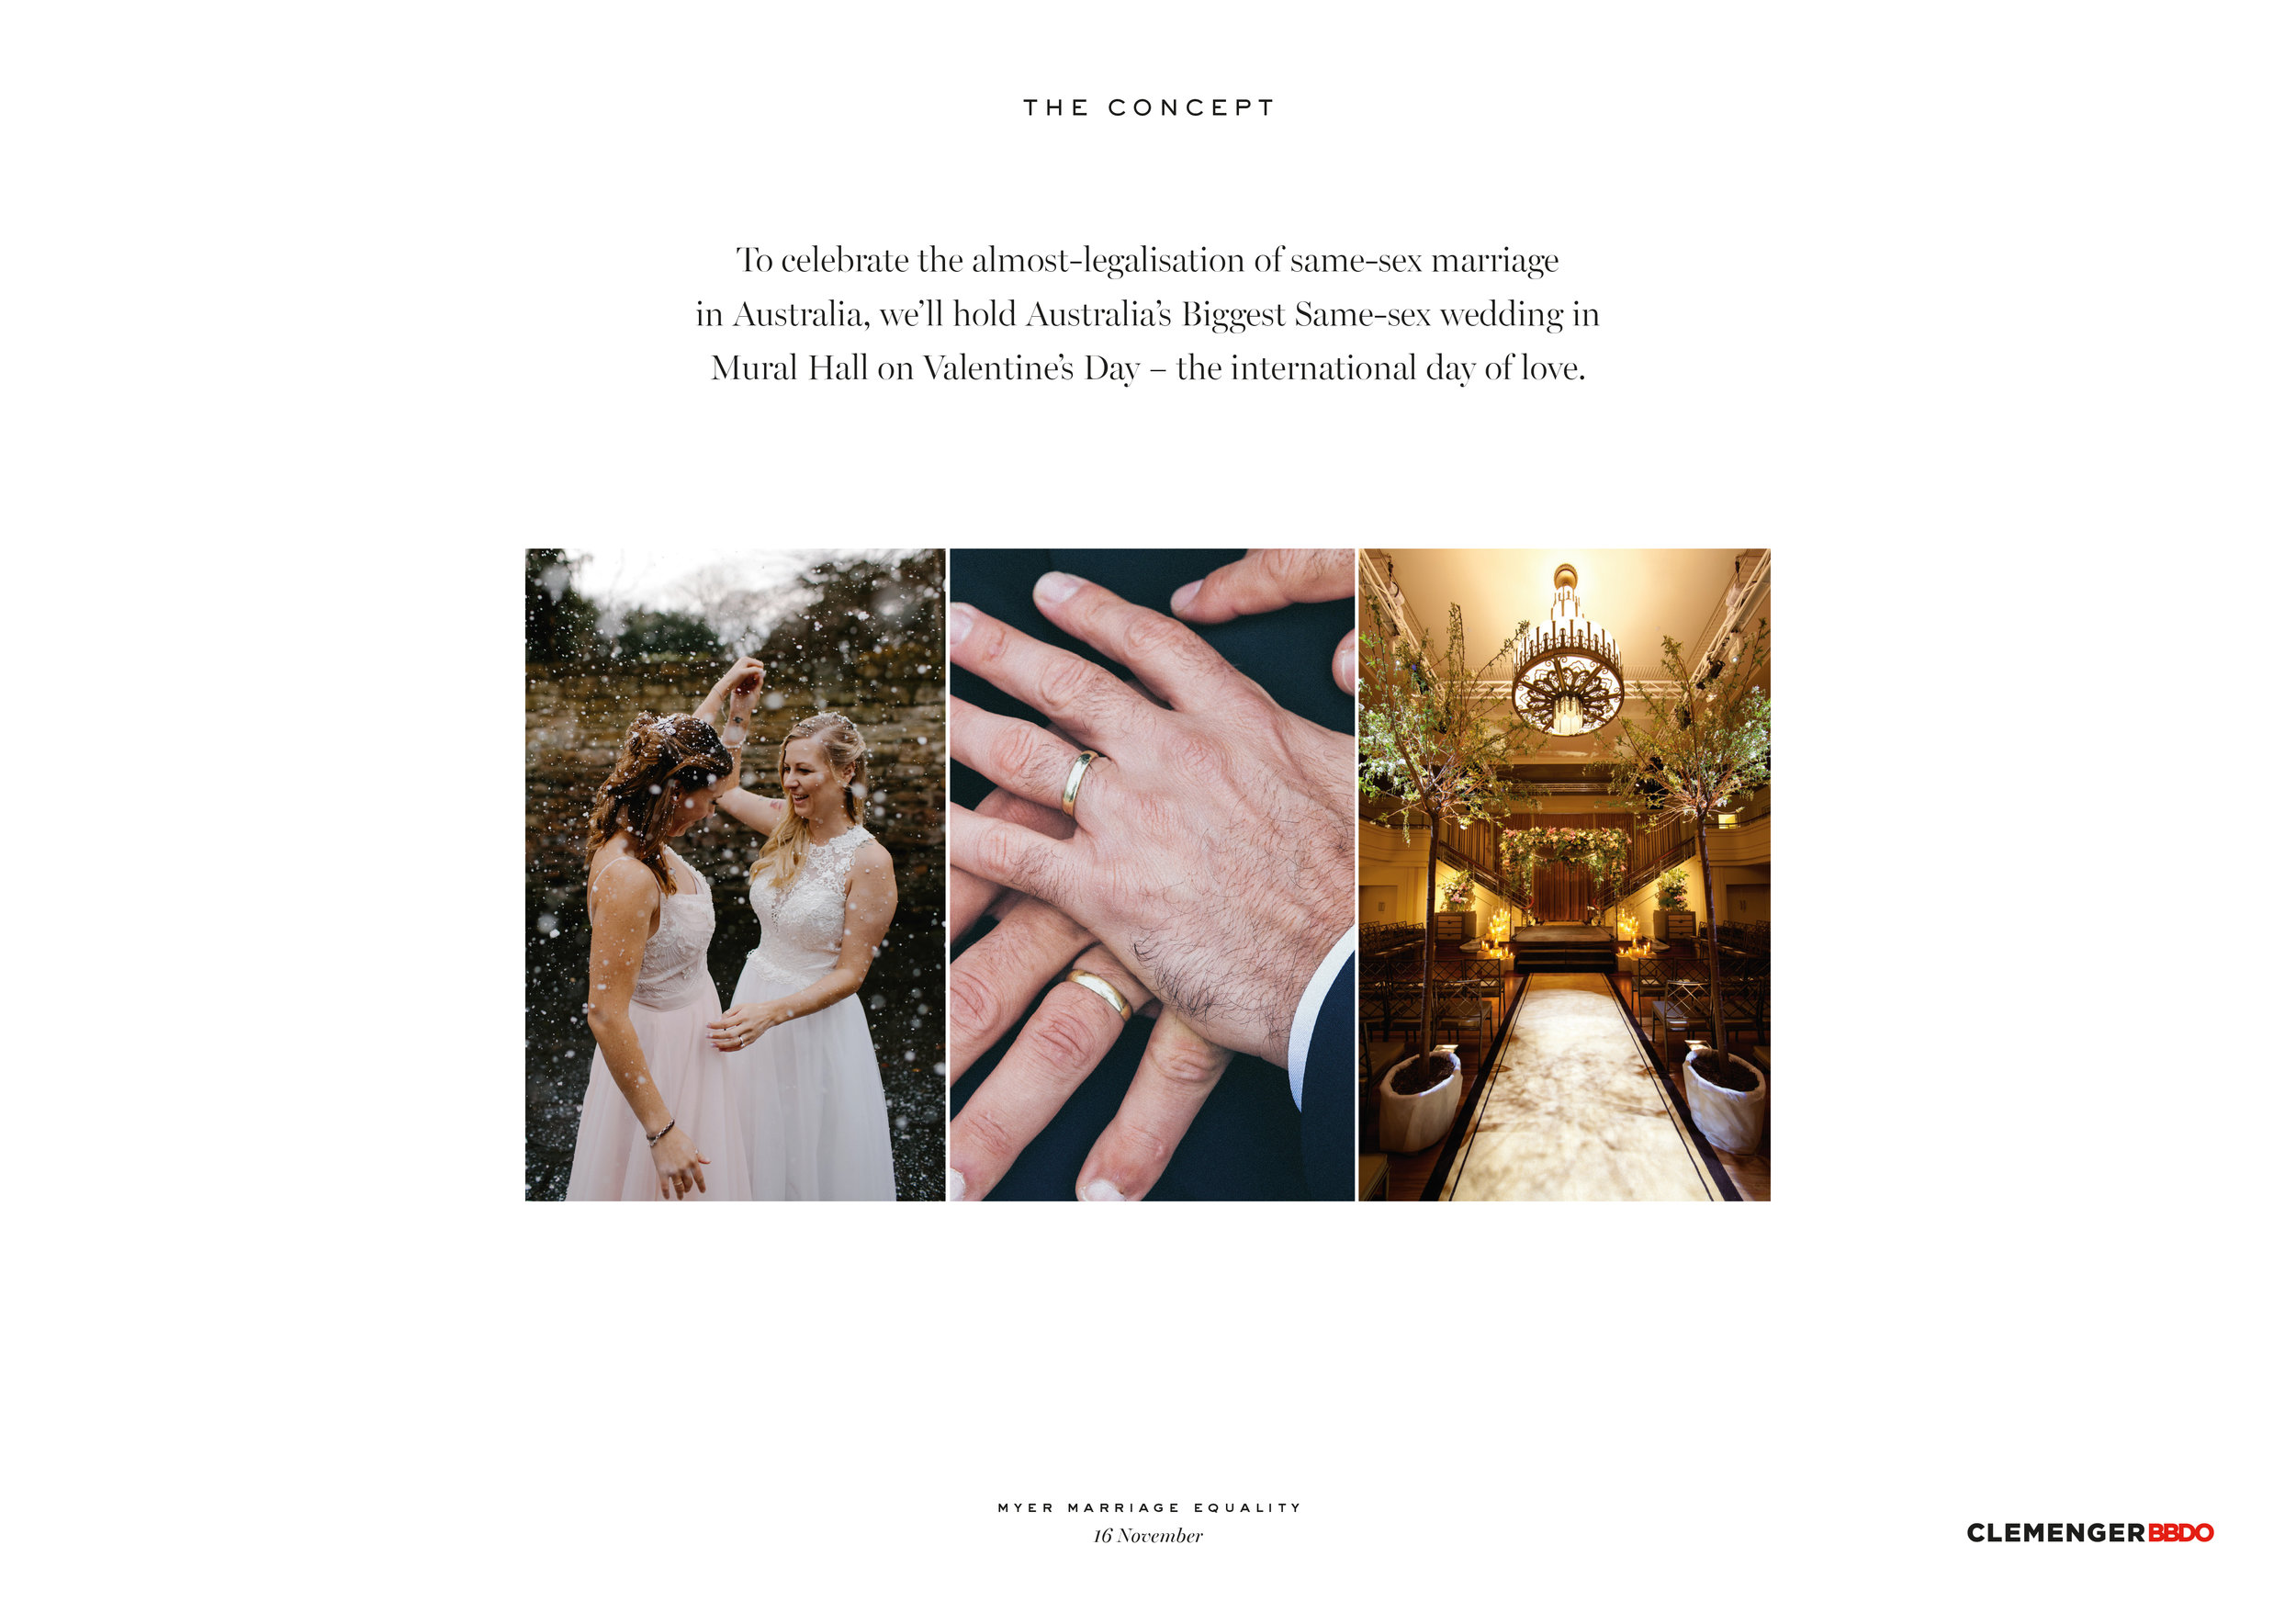 MYER3027_Marriage-Equality-Presentation-V05-2.jpg